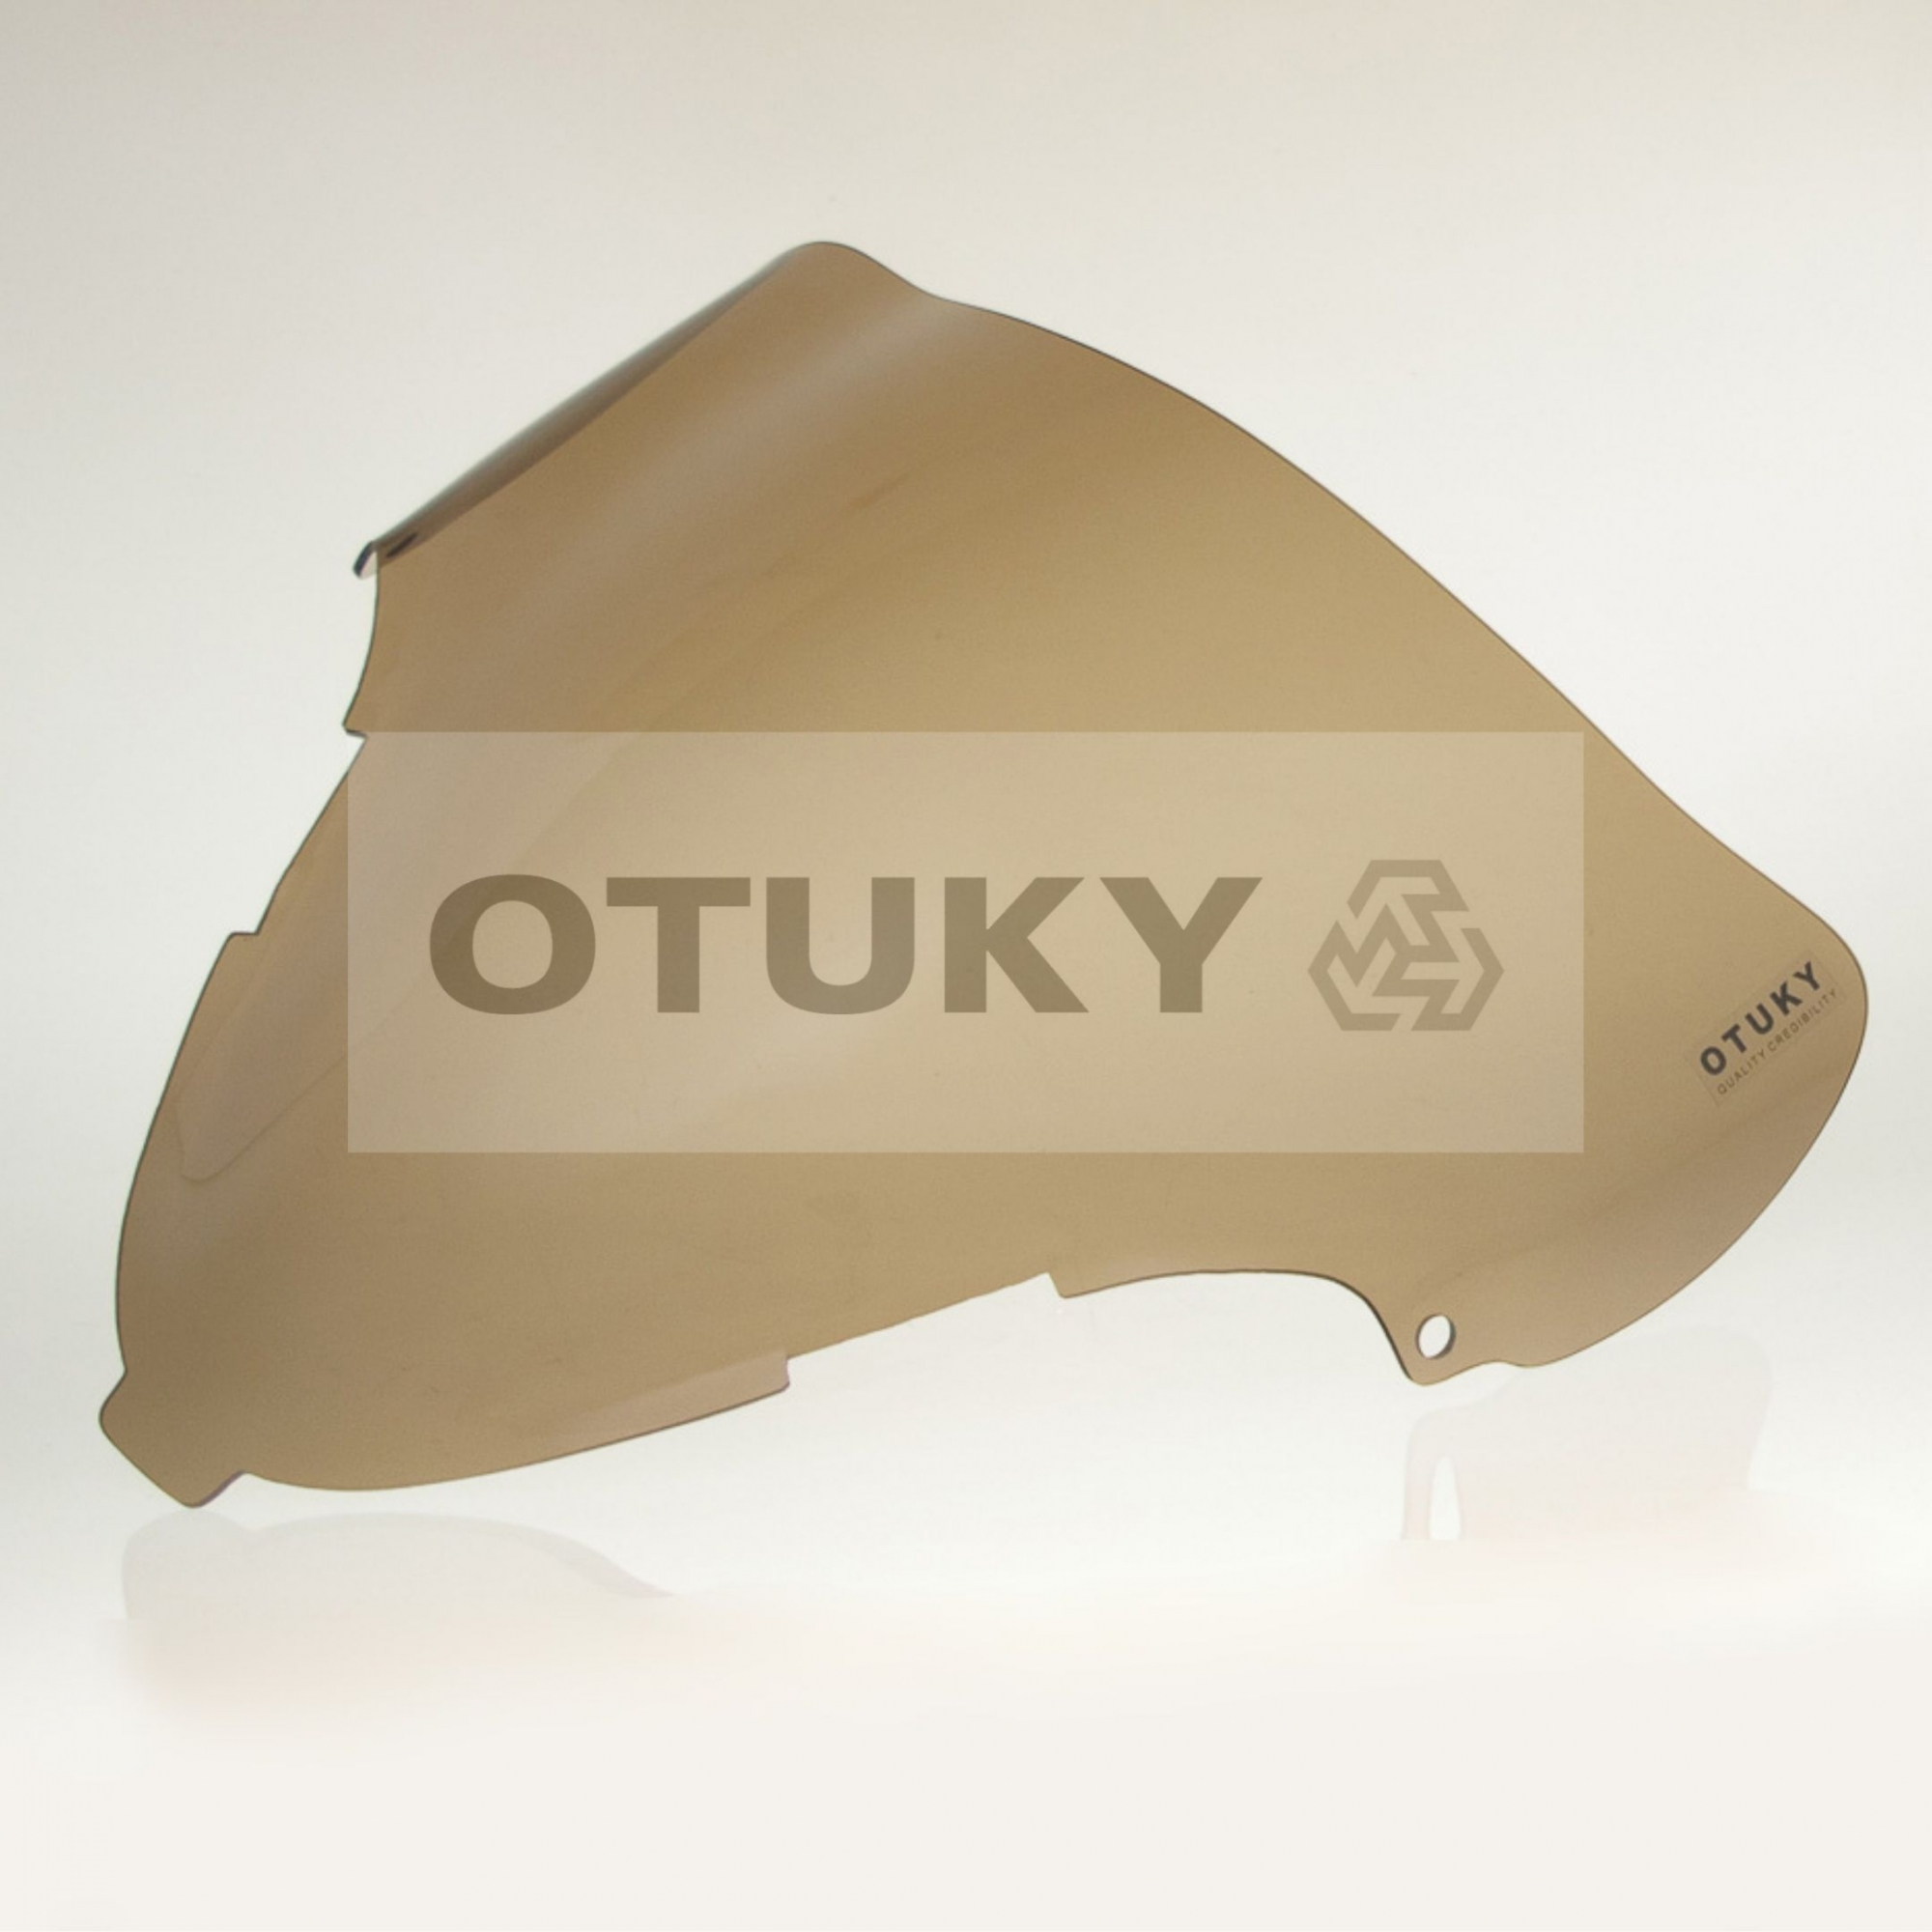 Bolha para Moto GSX 1300 R Hayabusa 1999 2000 2001 2002 2003 2004 2005 2006 2007 Otuky Fumê Marrom